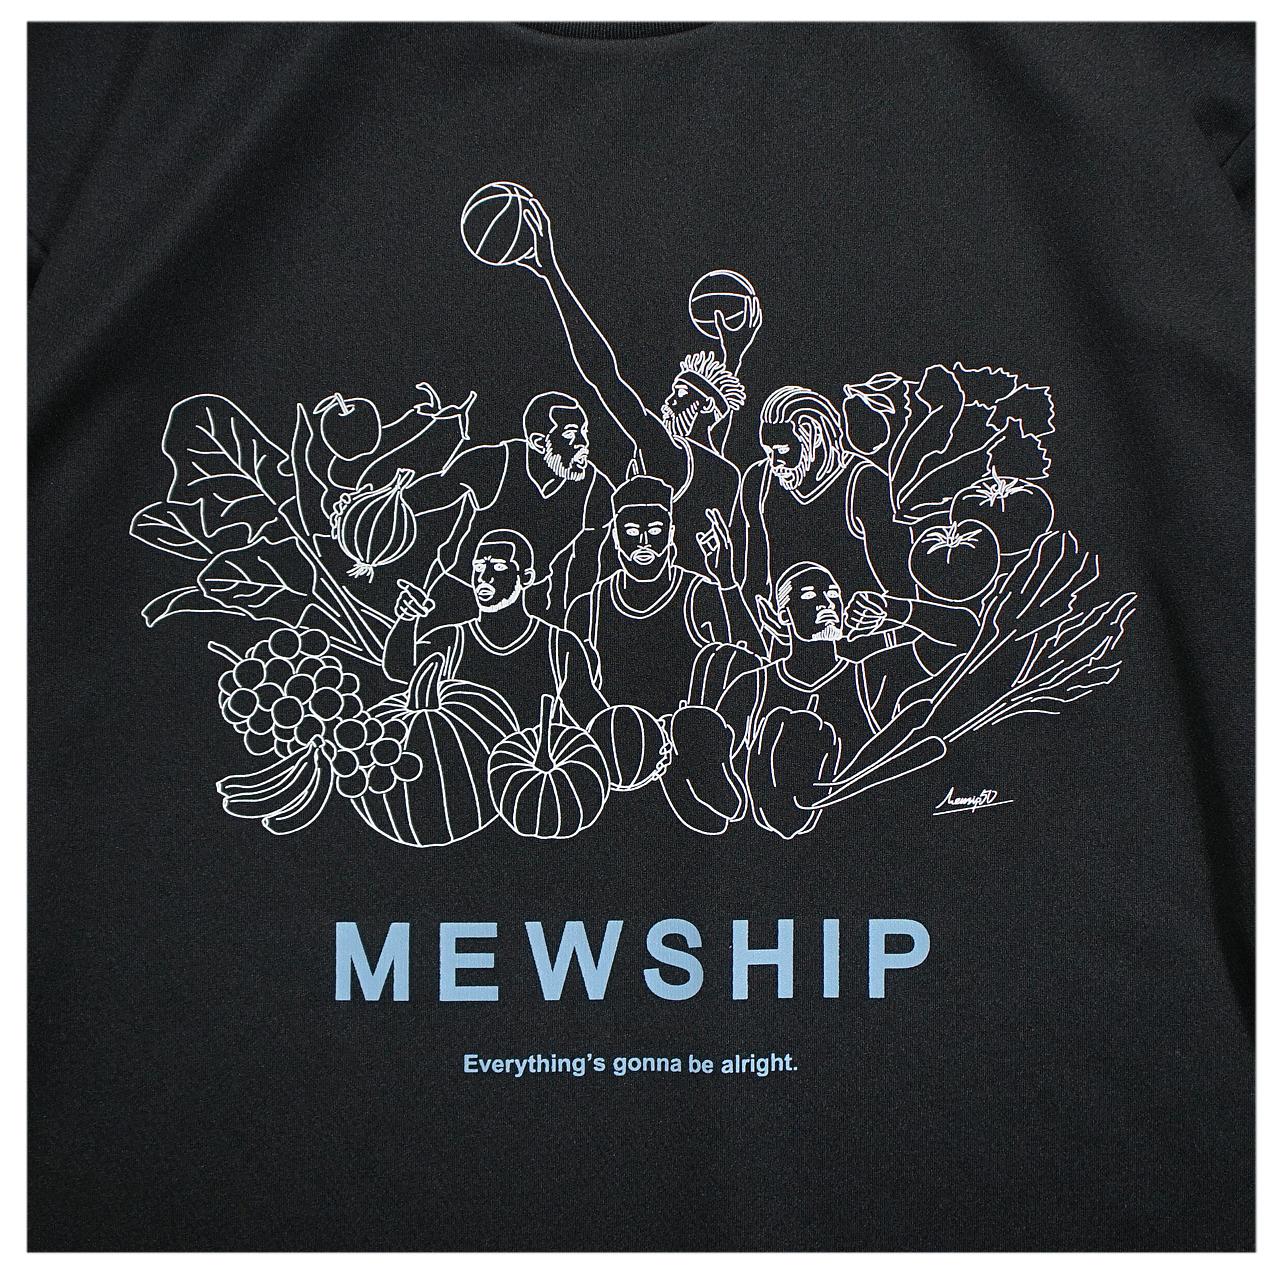 Mewship50 Vegetable friends S/S PL【Black×White×P.Blue】